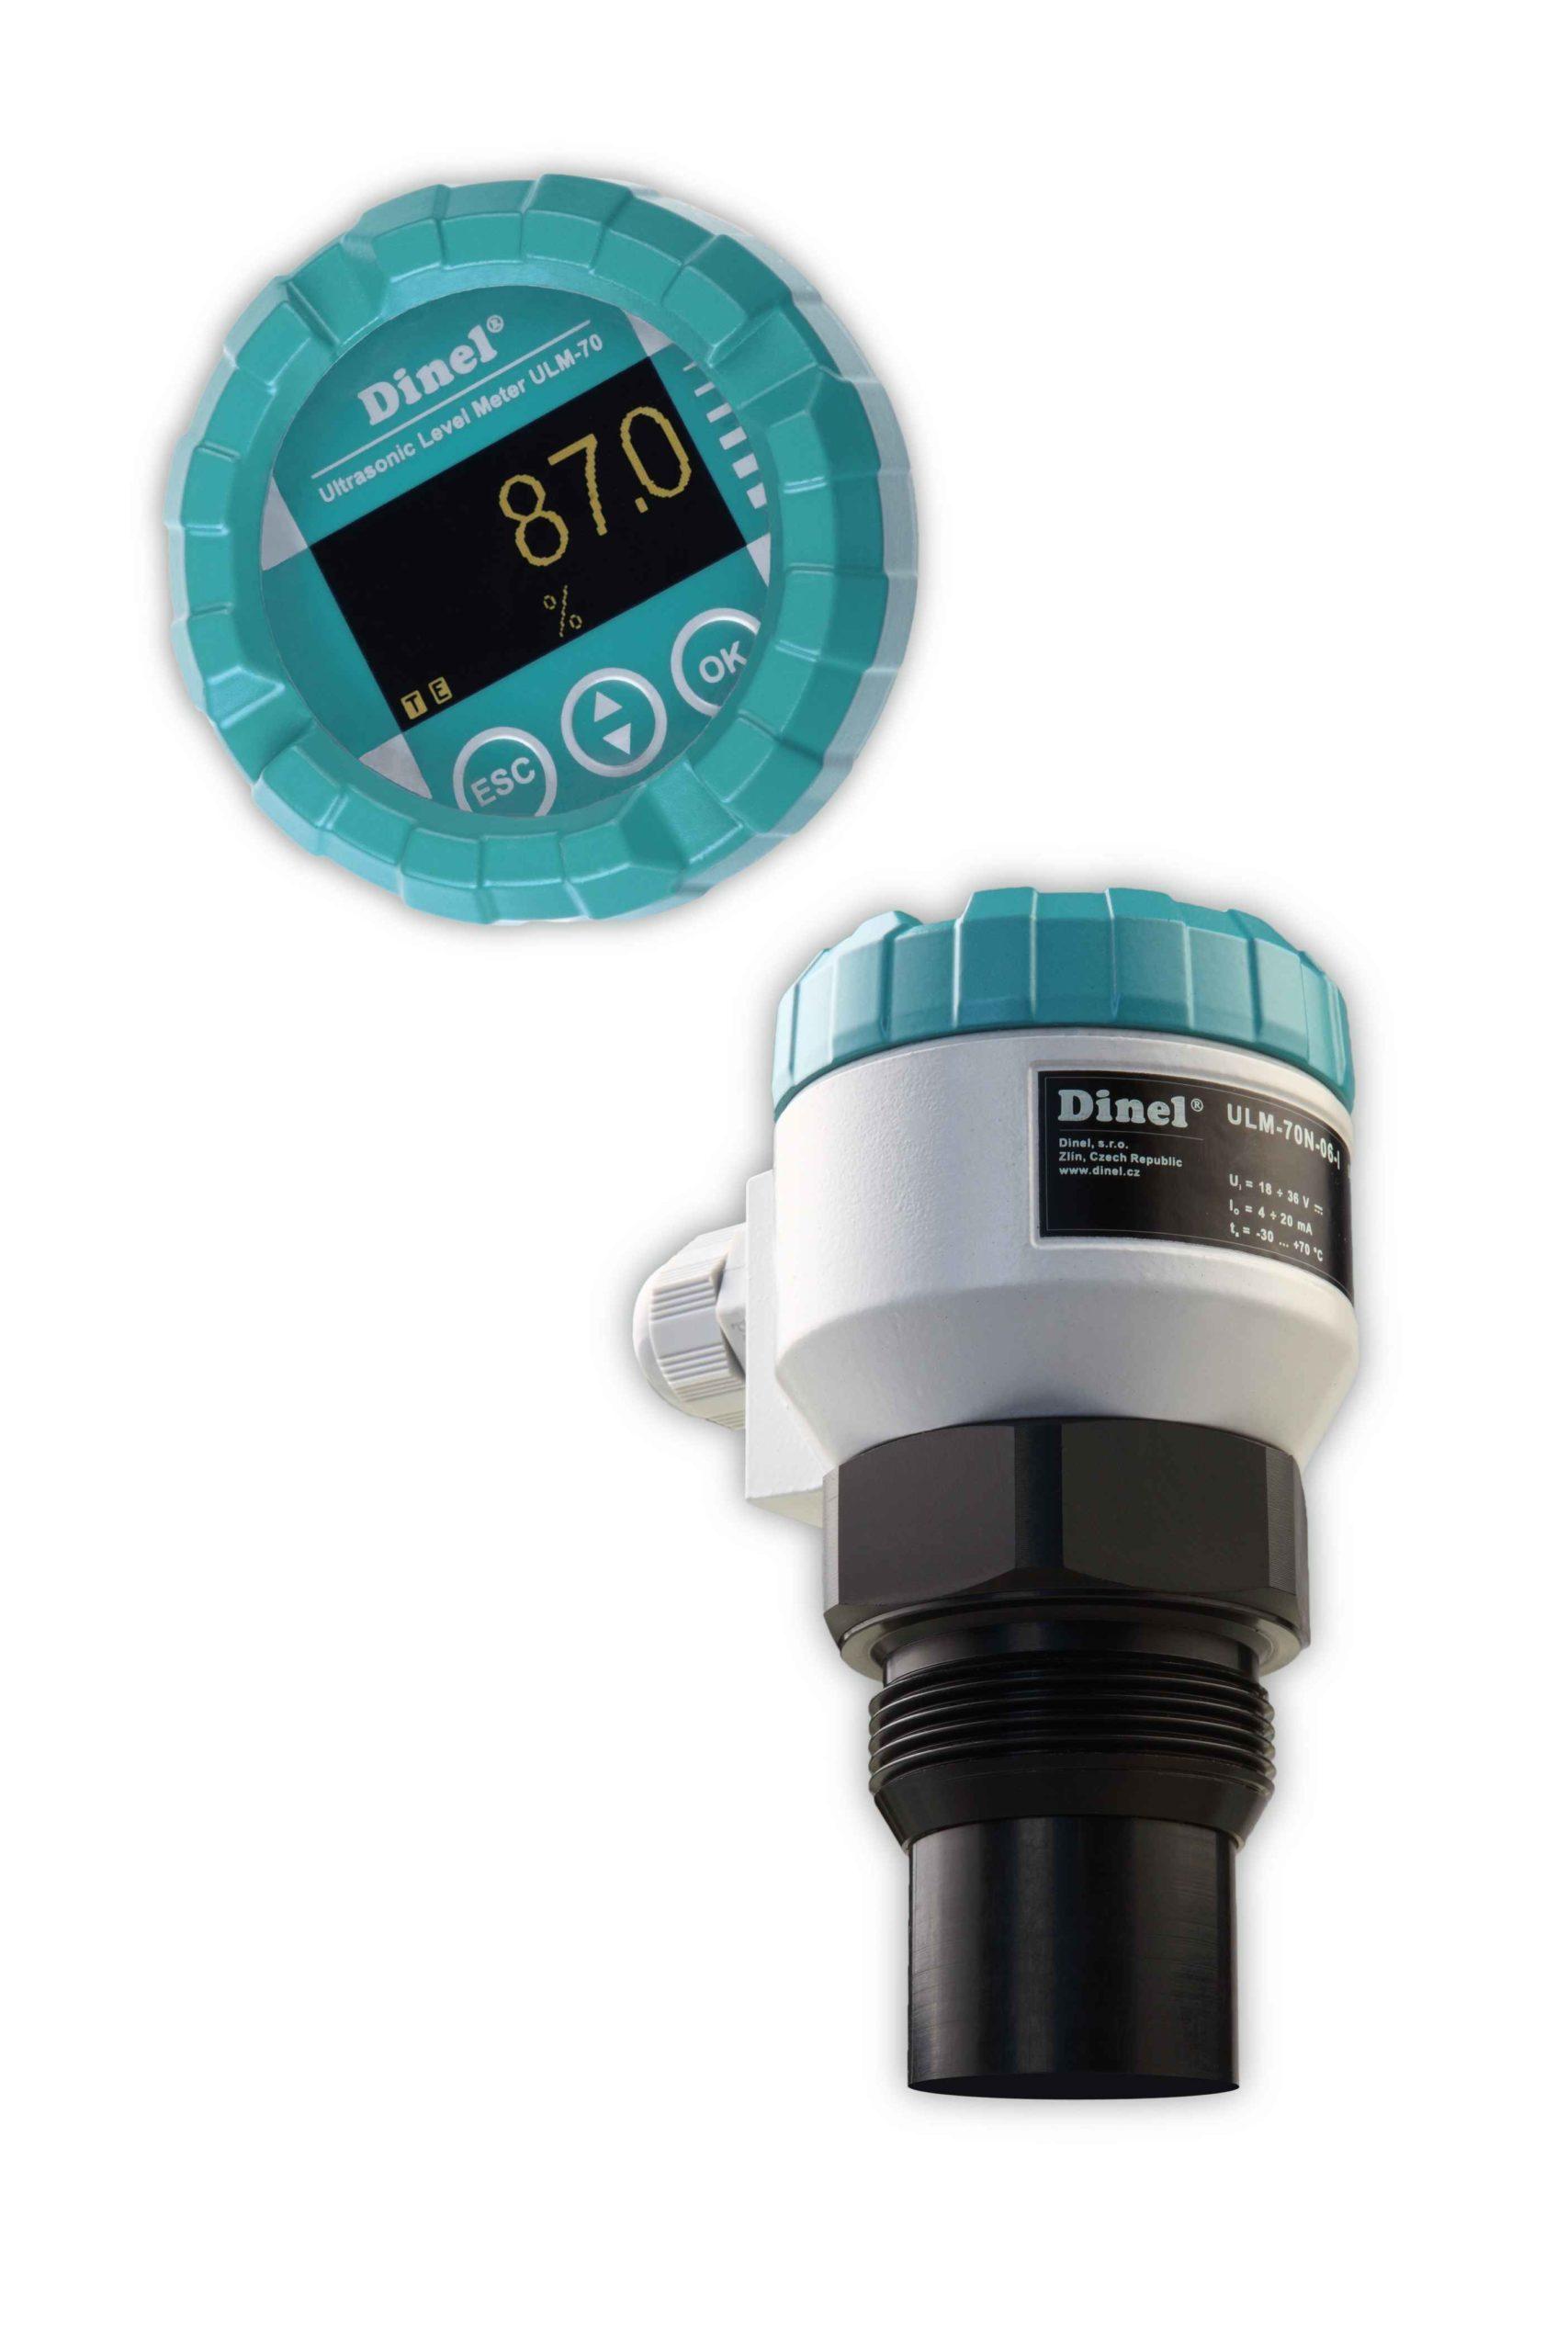 ULM-70 Ultrasonic Level Meter